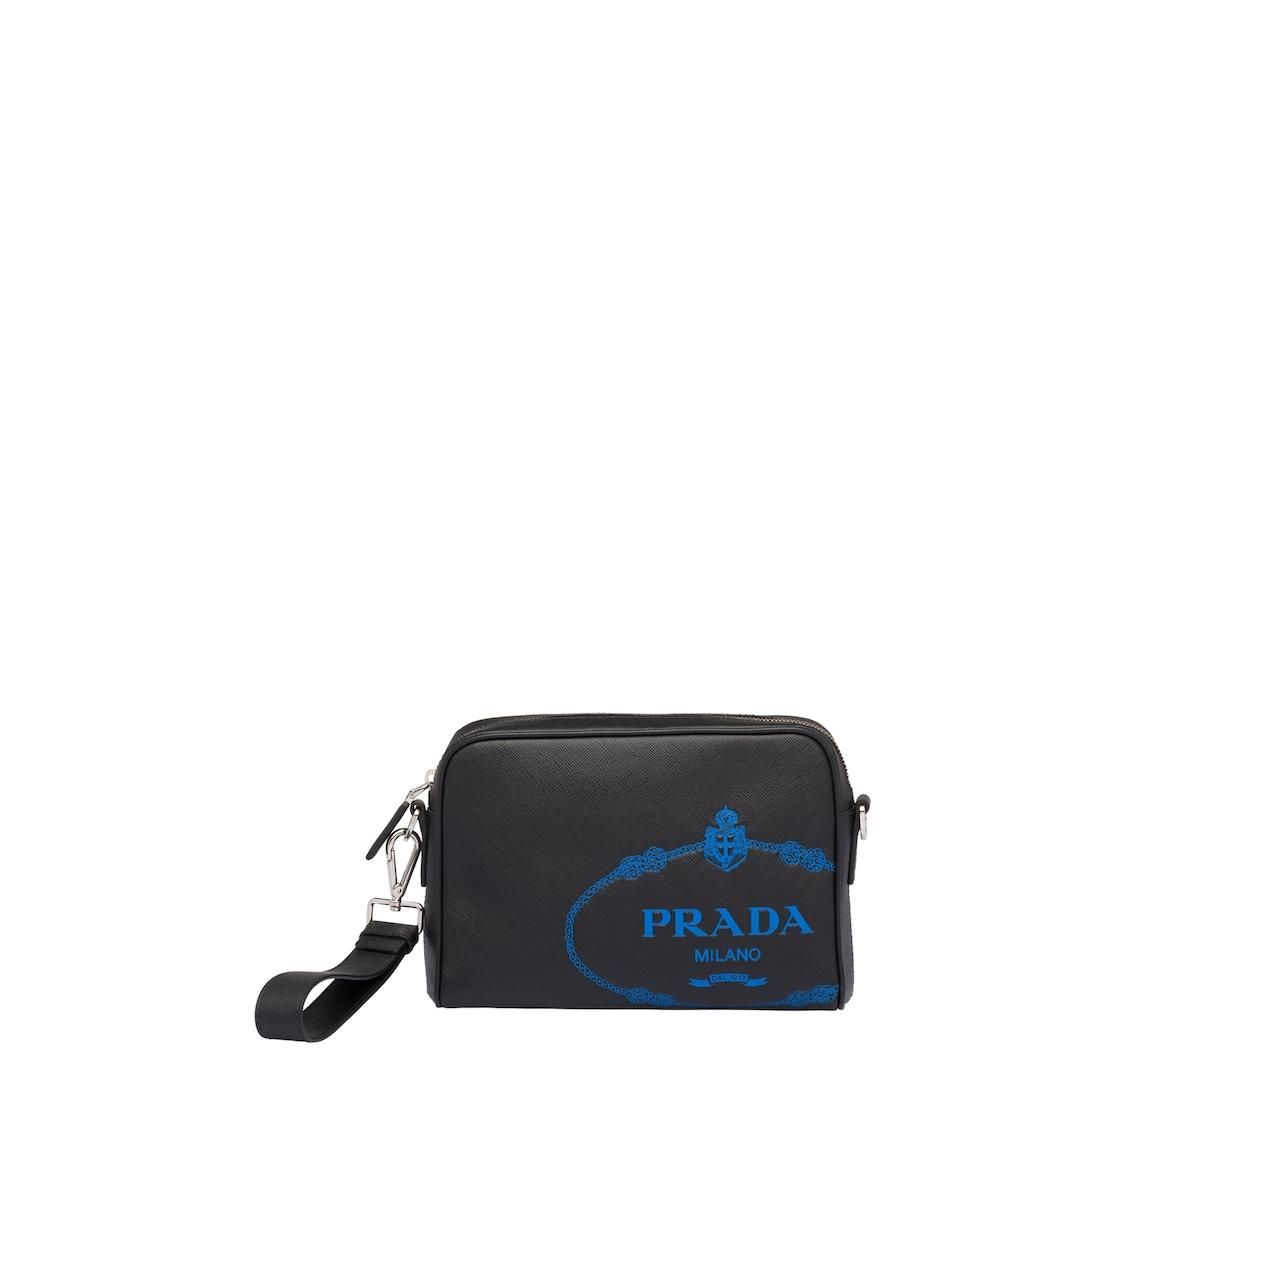 Saffiano leather bandoleer bag